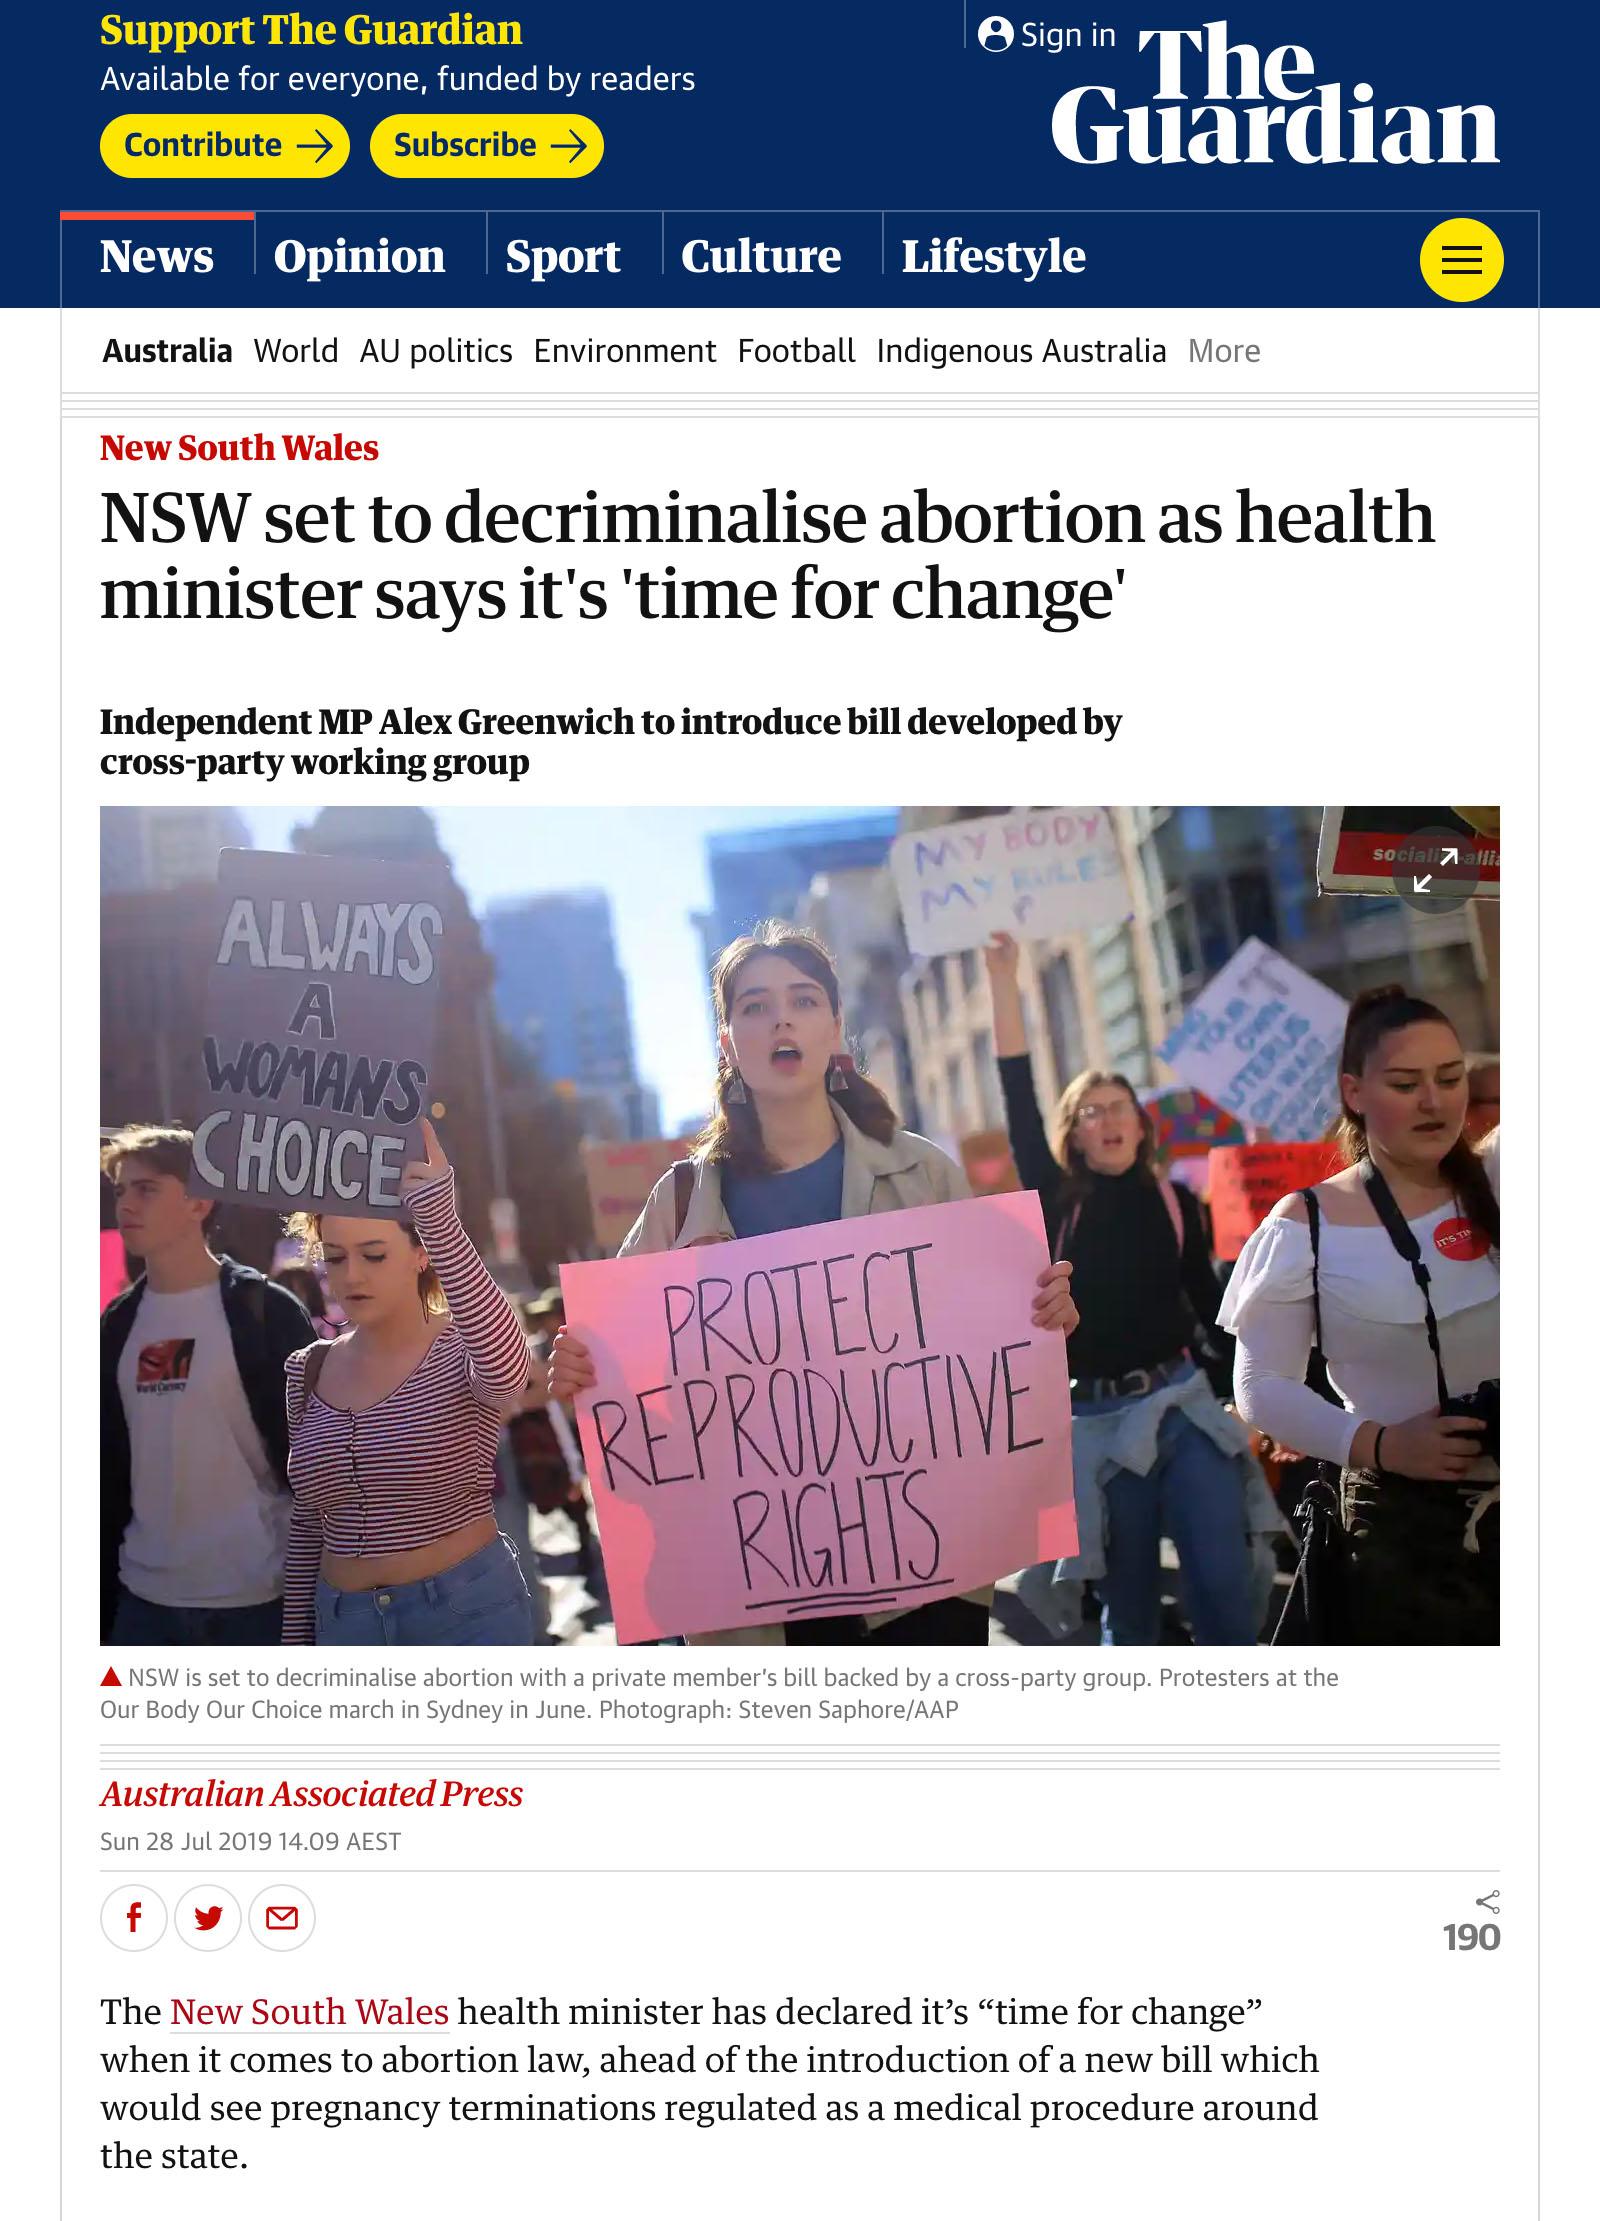 2019-07-28 www.theguardian.com NSW-set-to-decriminalise-abortion SMALL.jpg